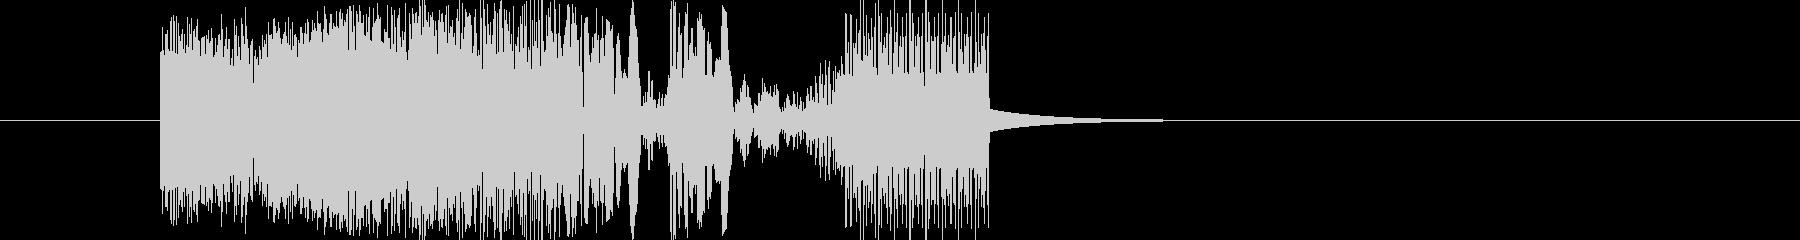 POWERTWIRLバージョン5の未再生の波形